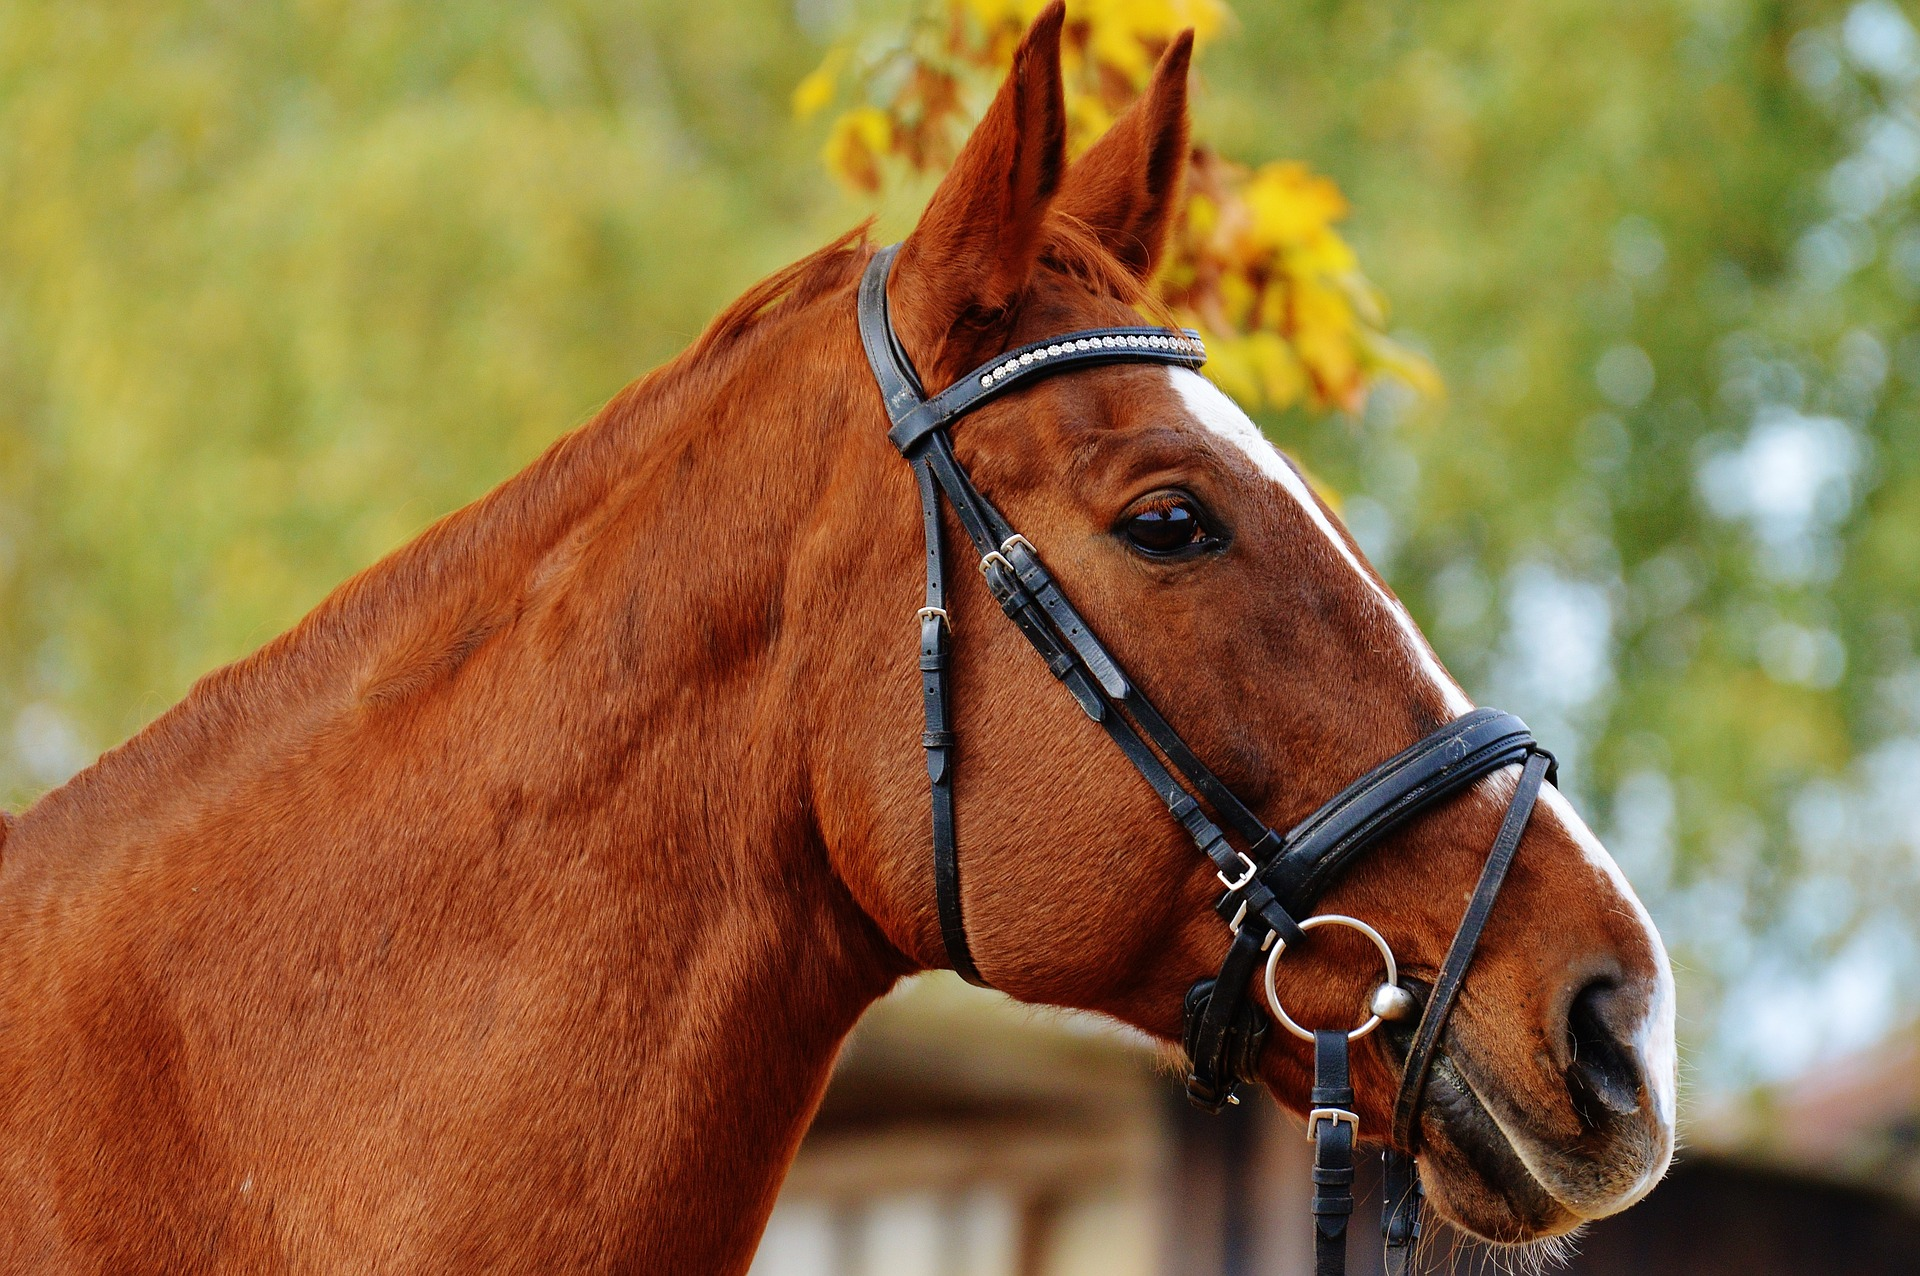 horse-1006568_1920